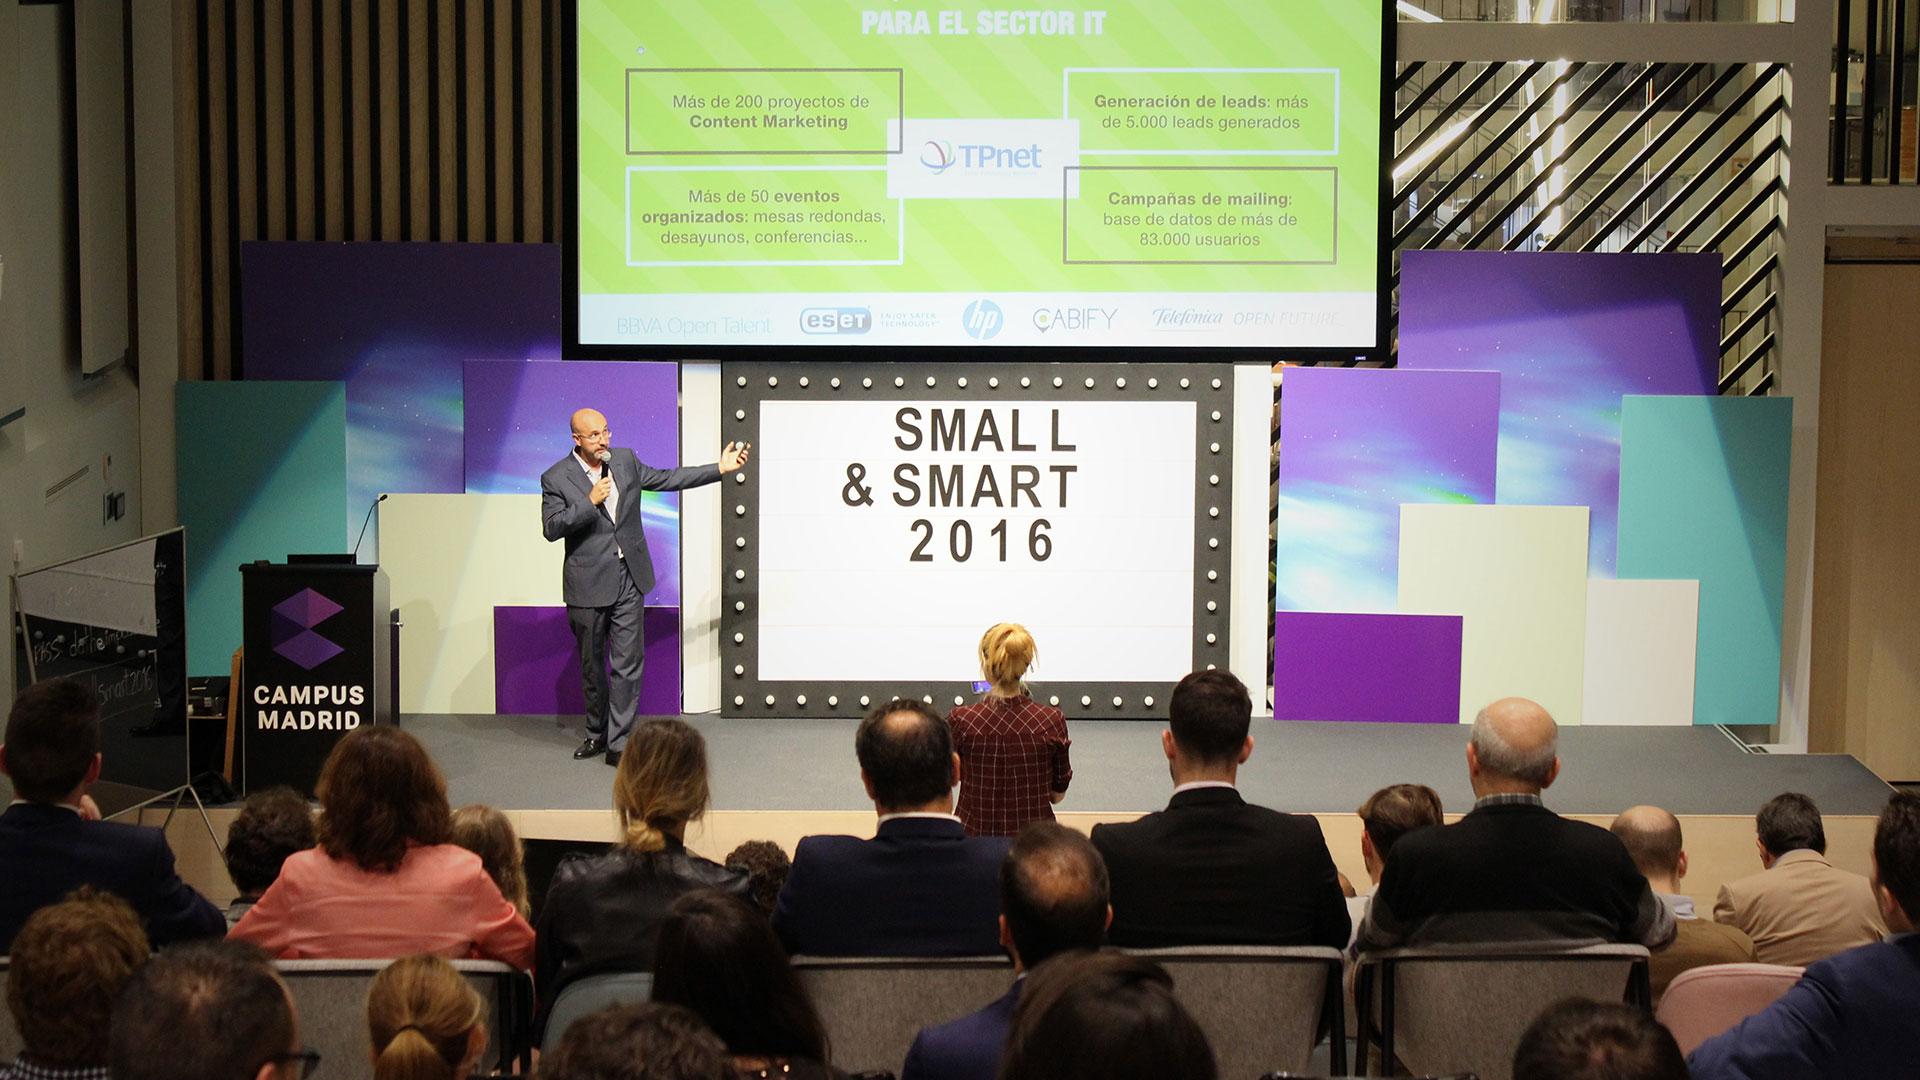 tpnet-small-smart-2016-evento-startups-prersentacion-javier-perez-cortijo